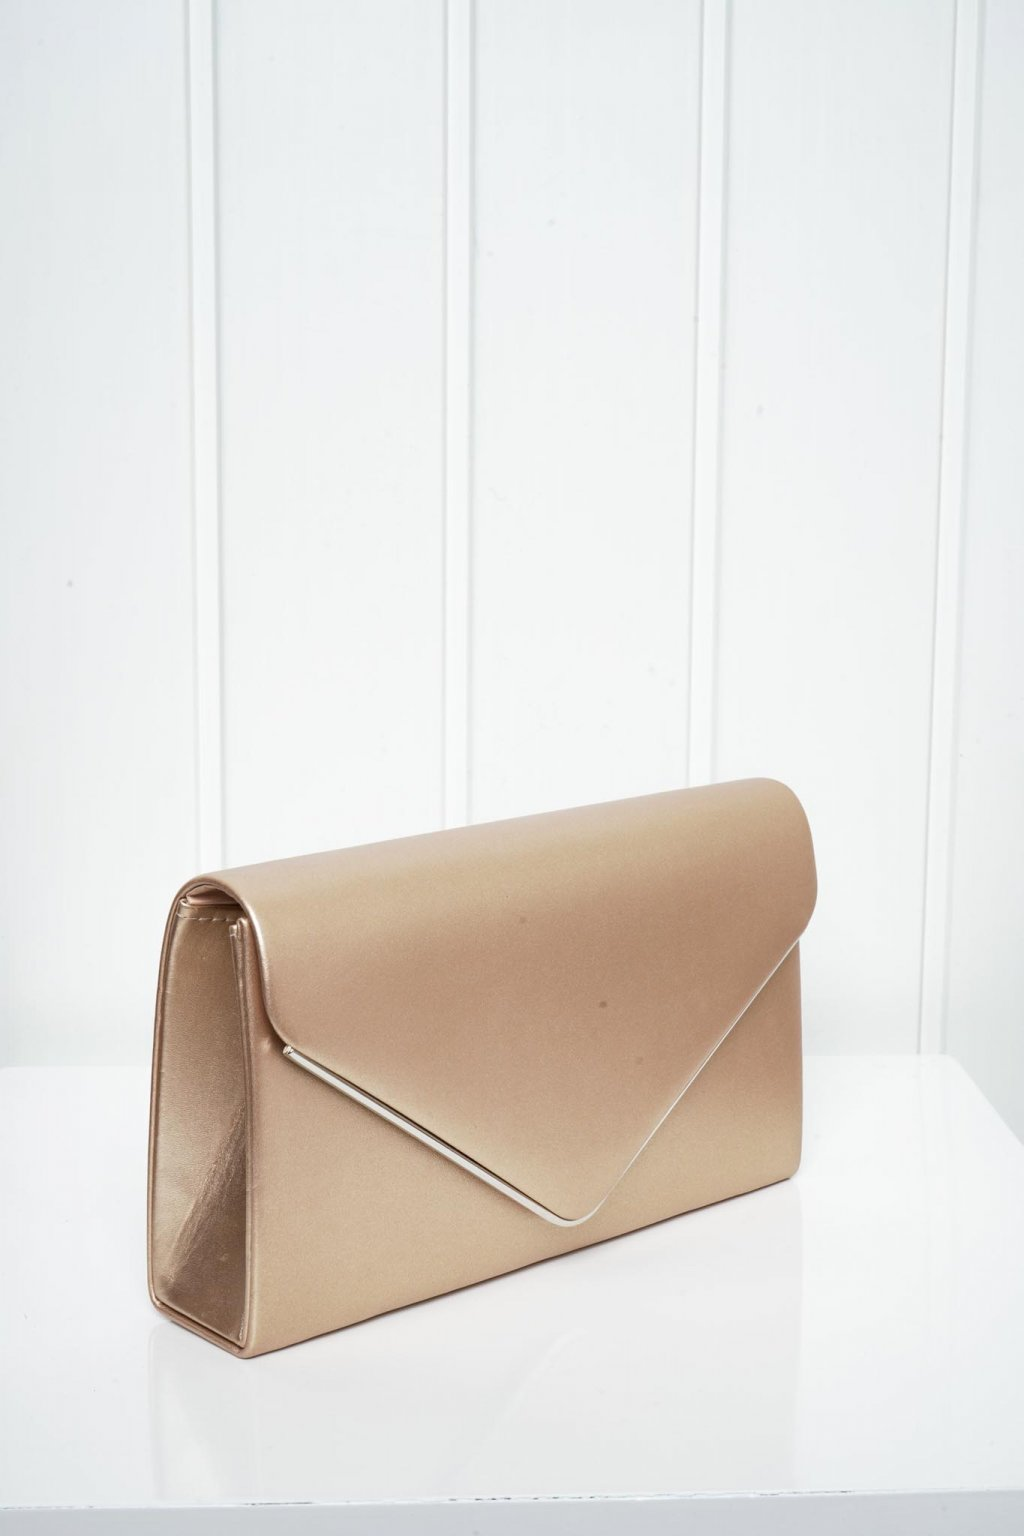 Kabelka, crossbody, ruksak, shopping bag, shopperka, 524